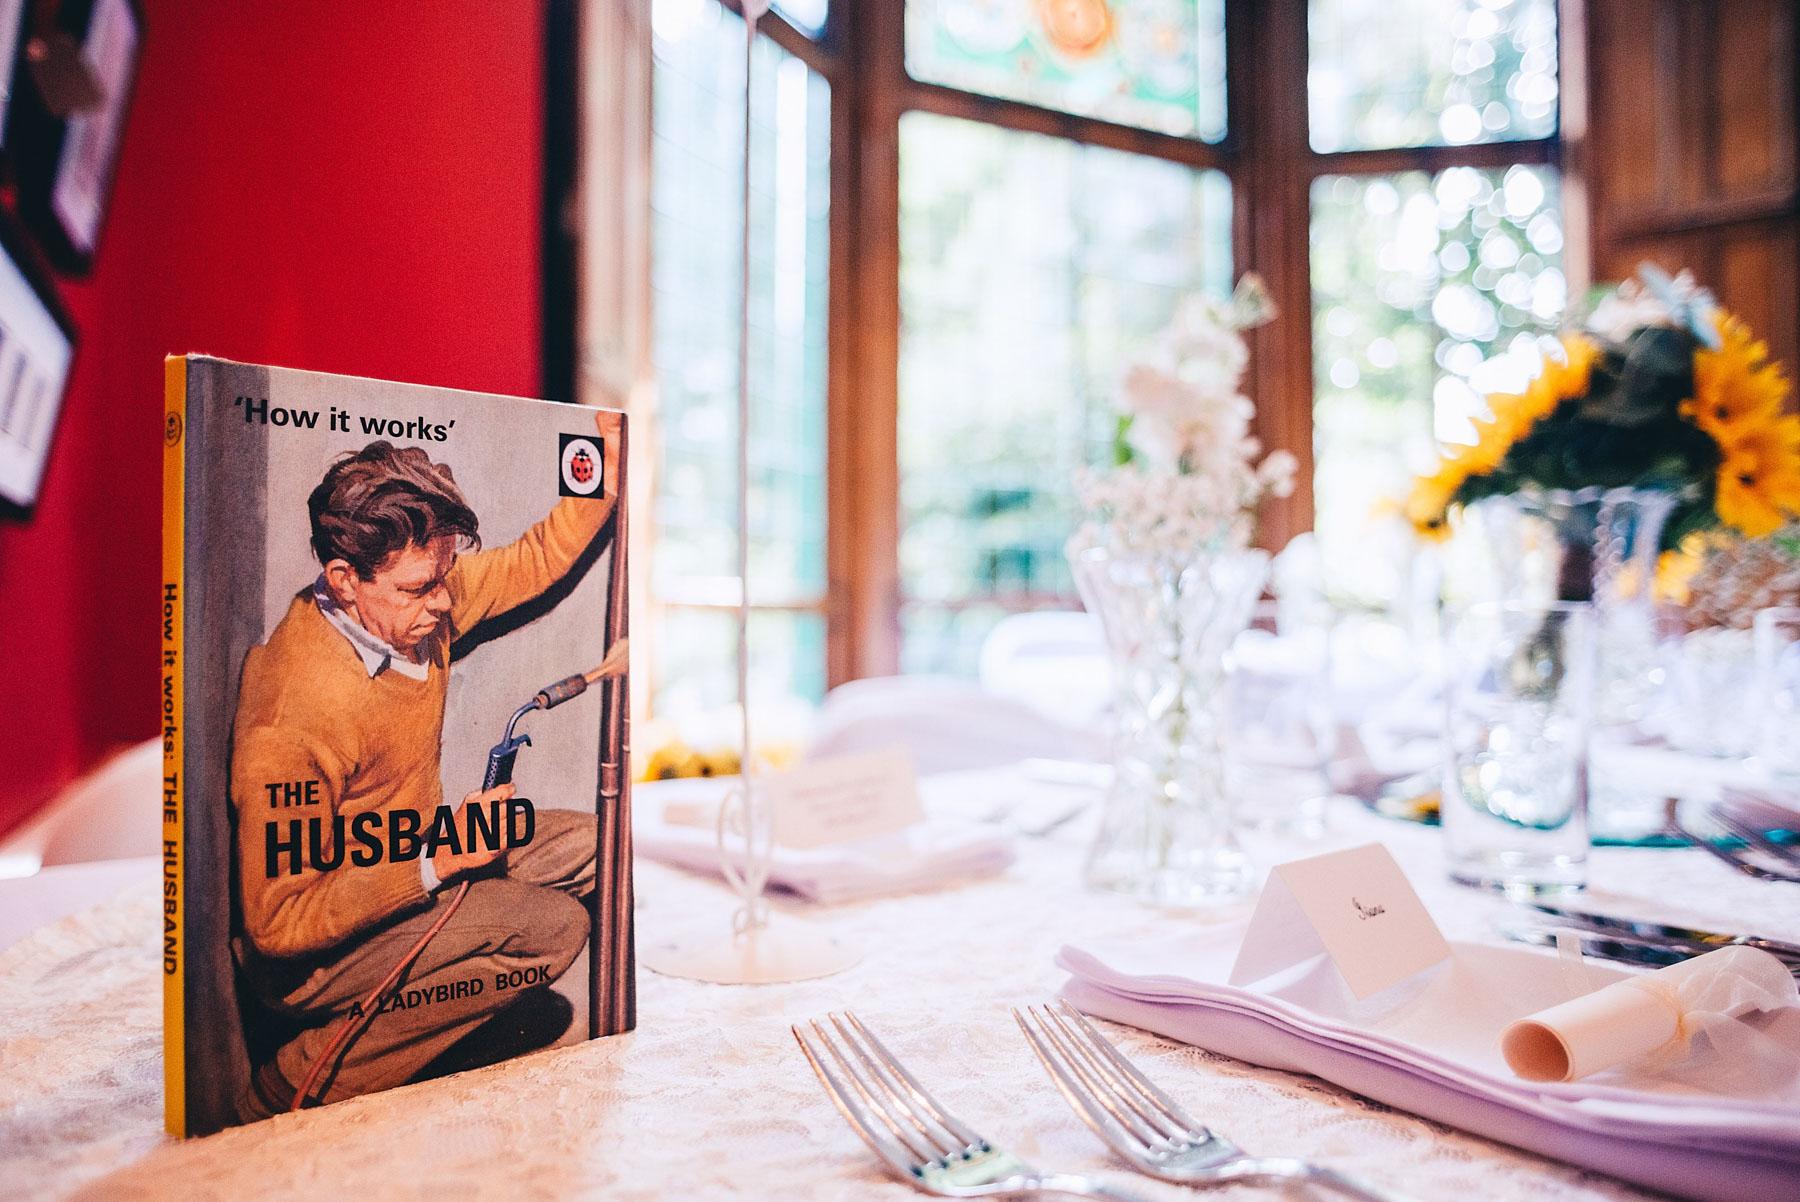 The husband ladybird book set up on wedding table